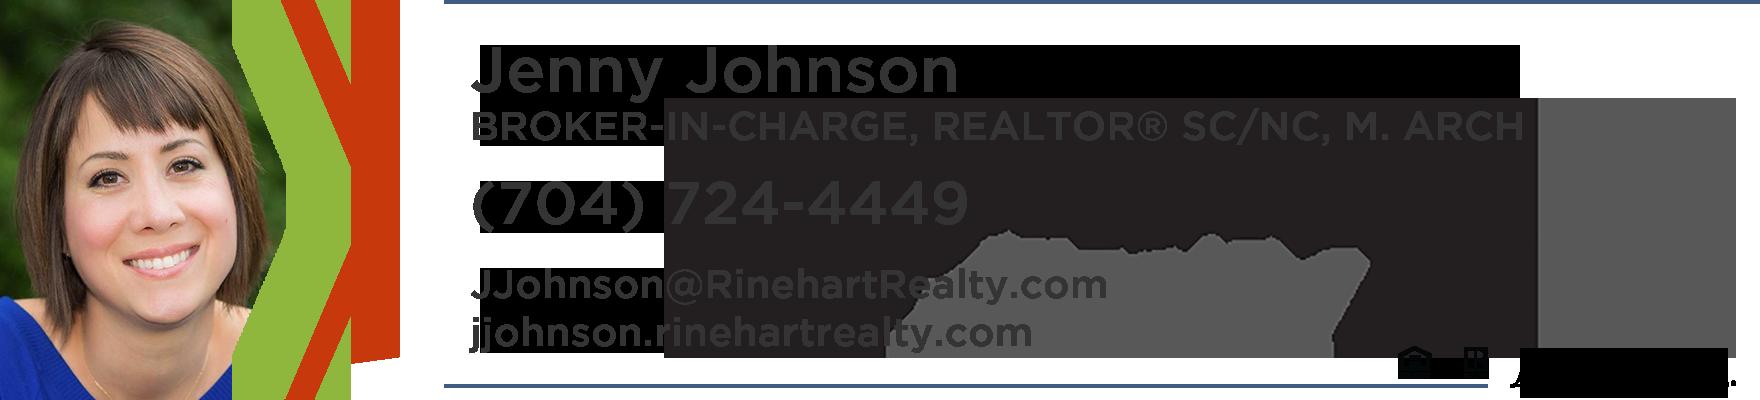 Jenny Johnson Broker in charge Realtor